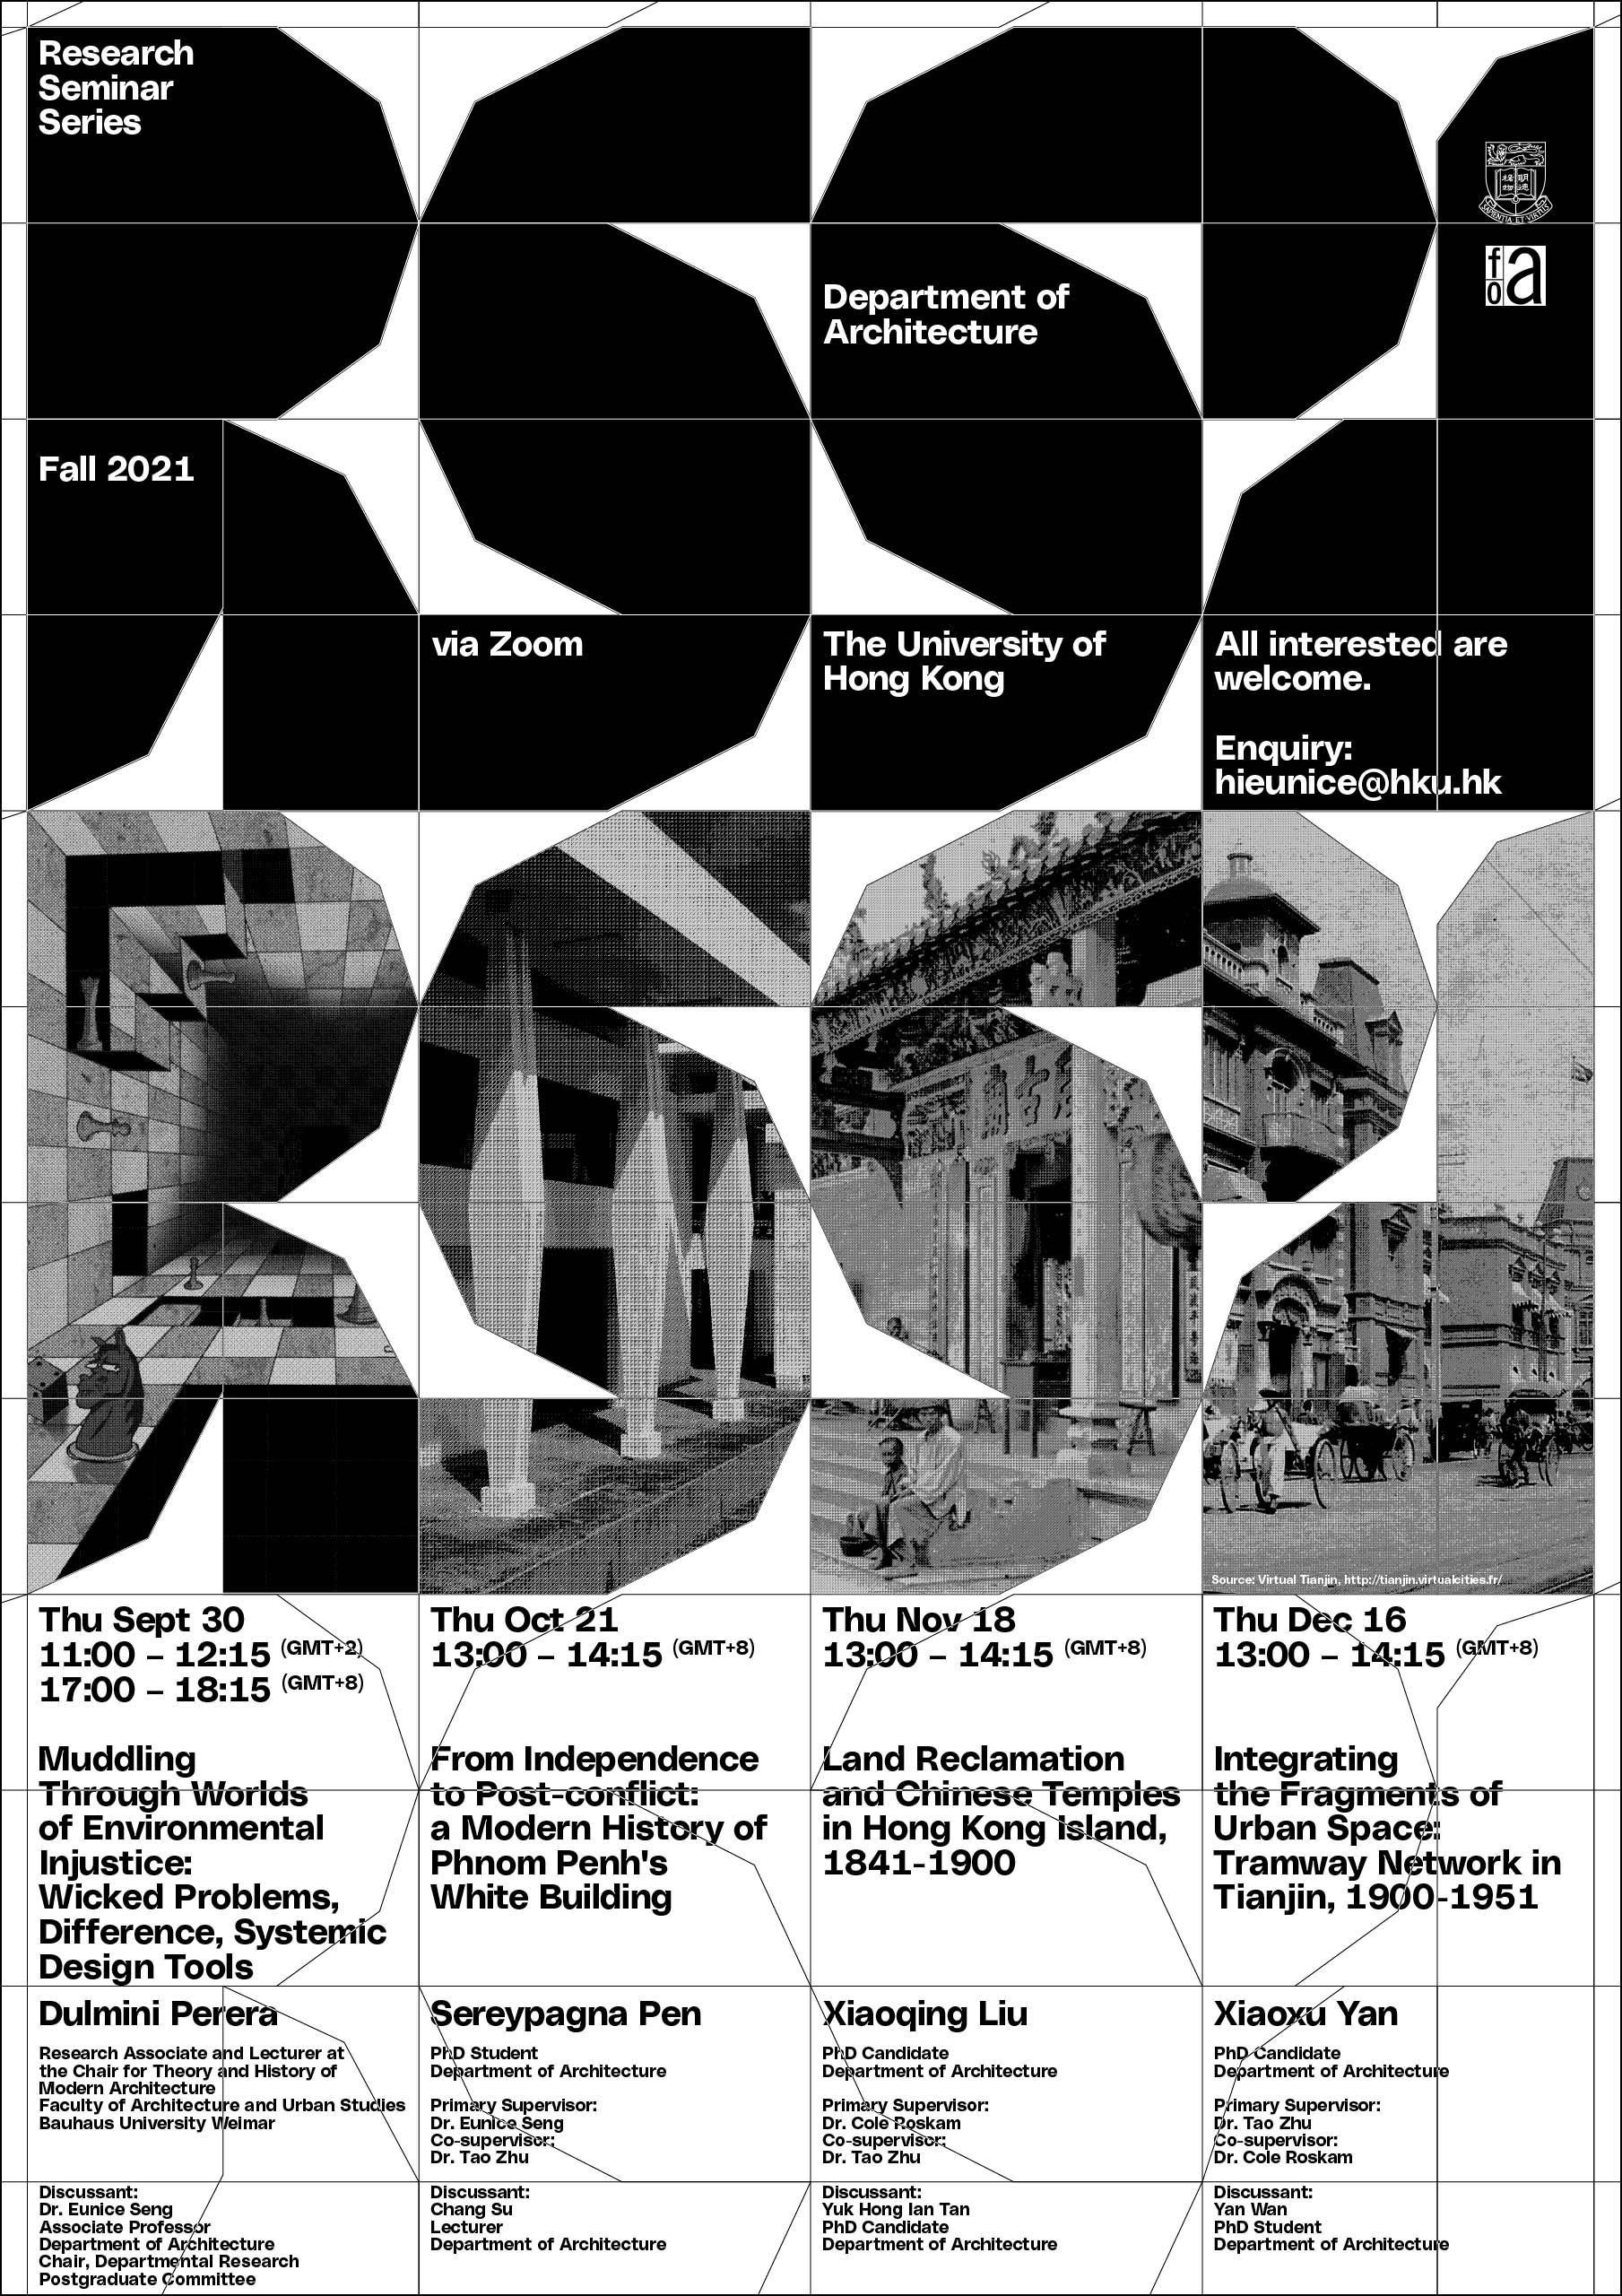 Research Seminar Series Fall 2021